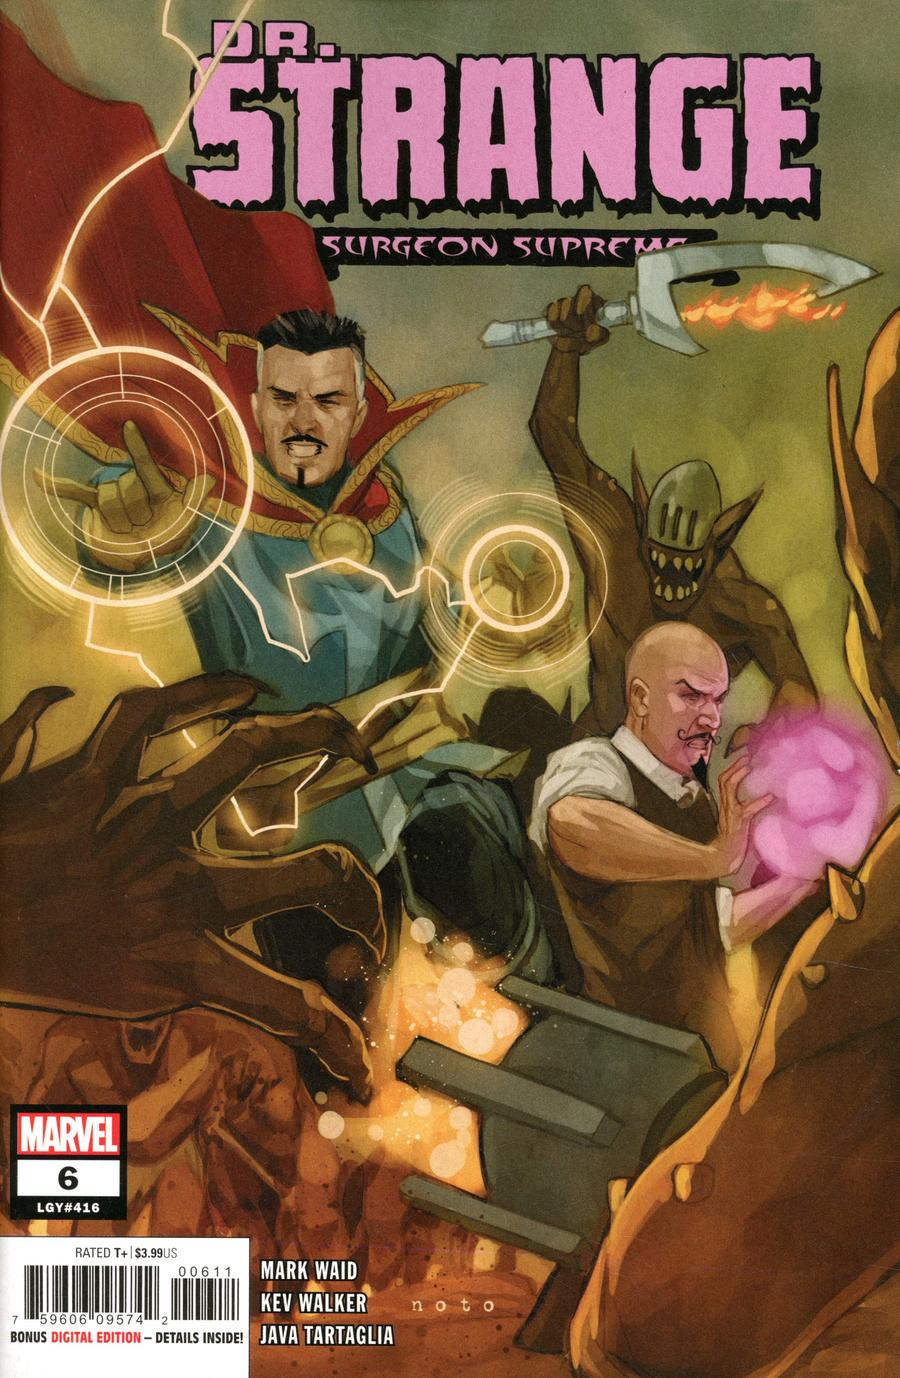 Doctor Strange Surgeon Supreme #6